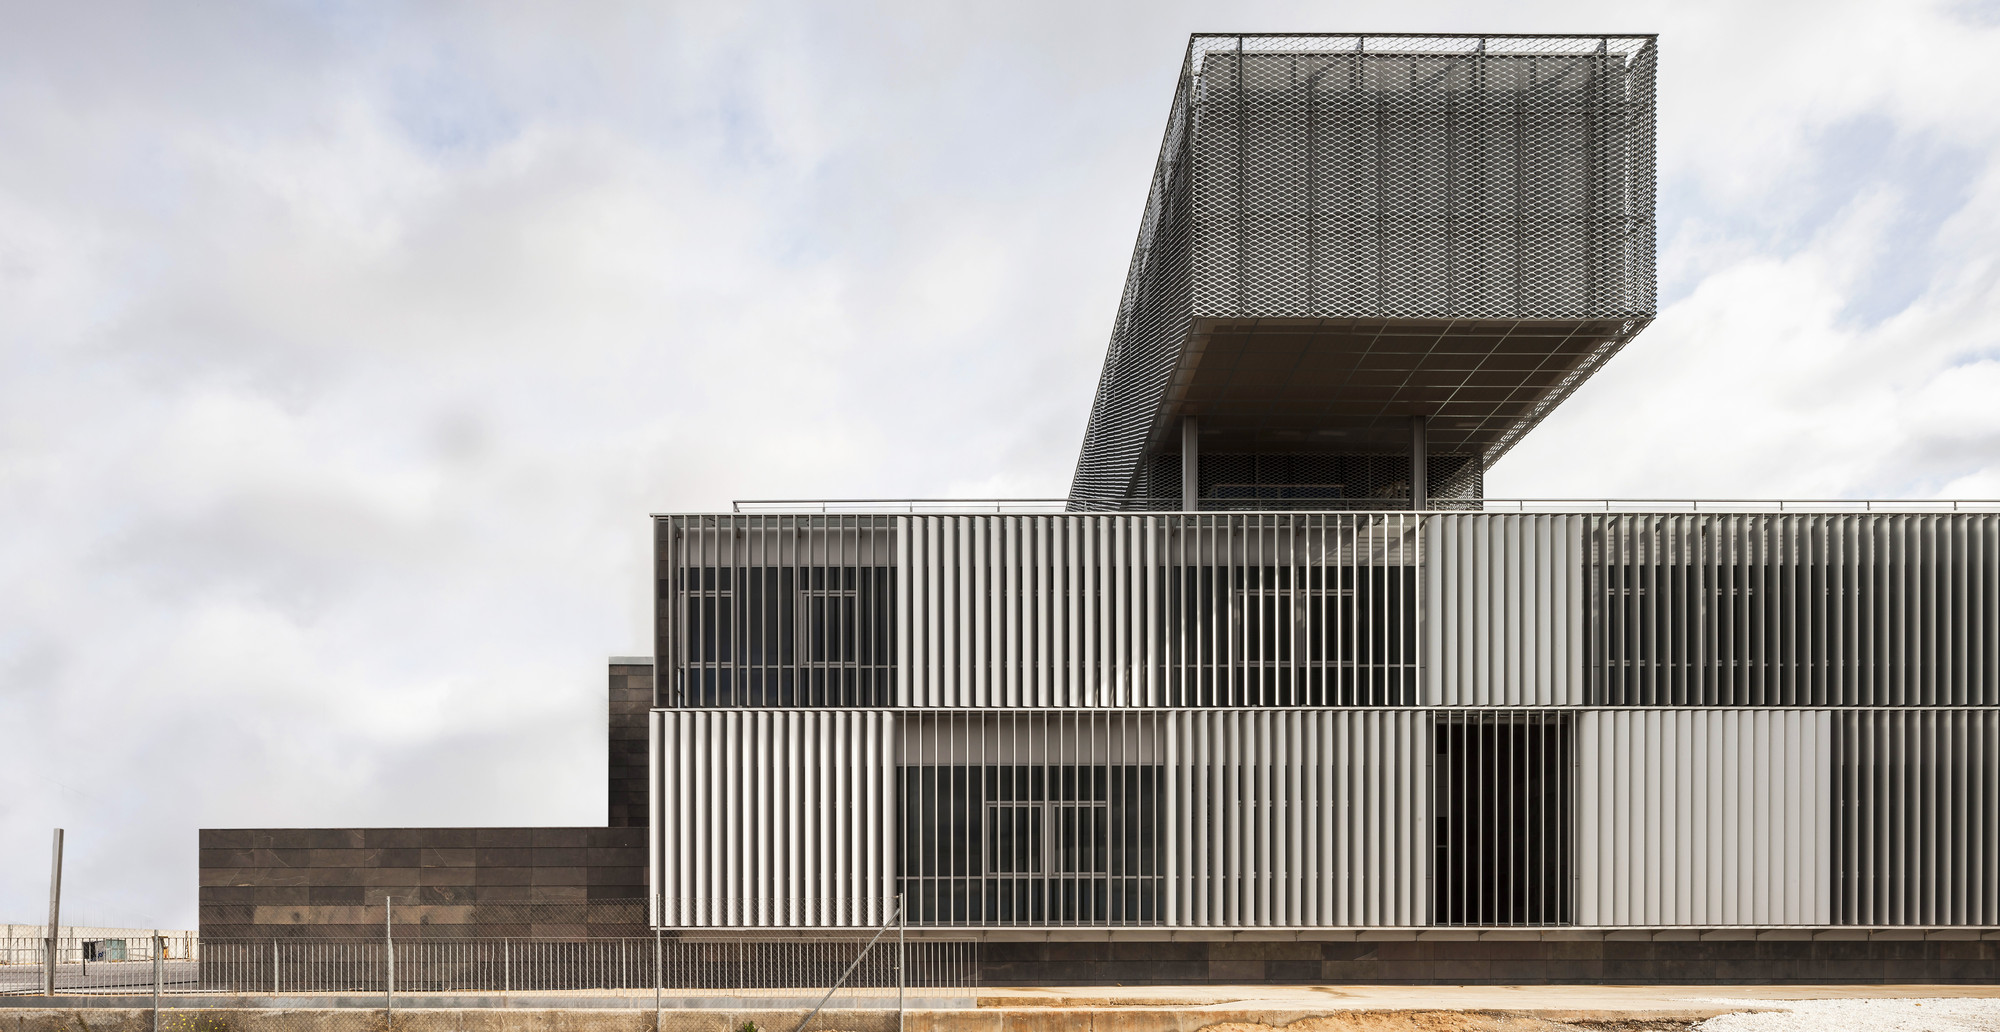 Courtesy of CANVAS Arquitectos